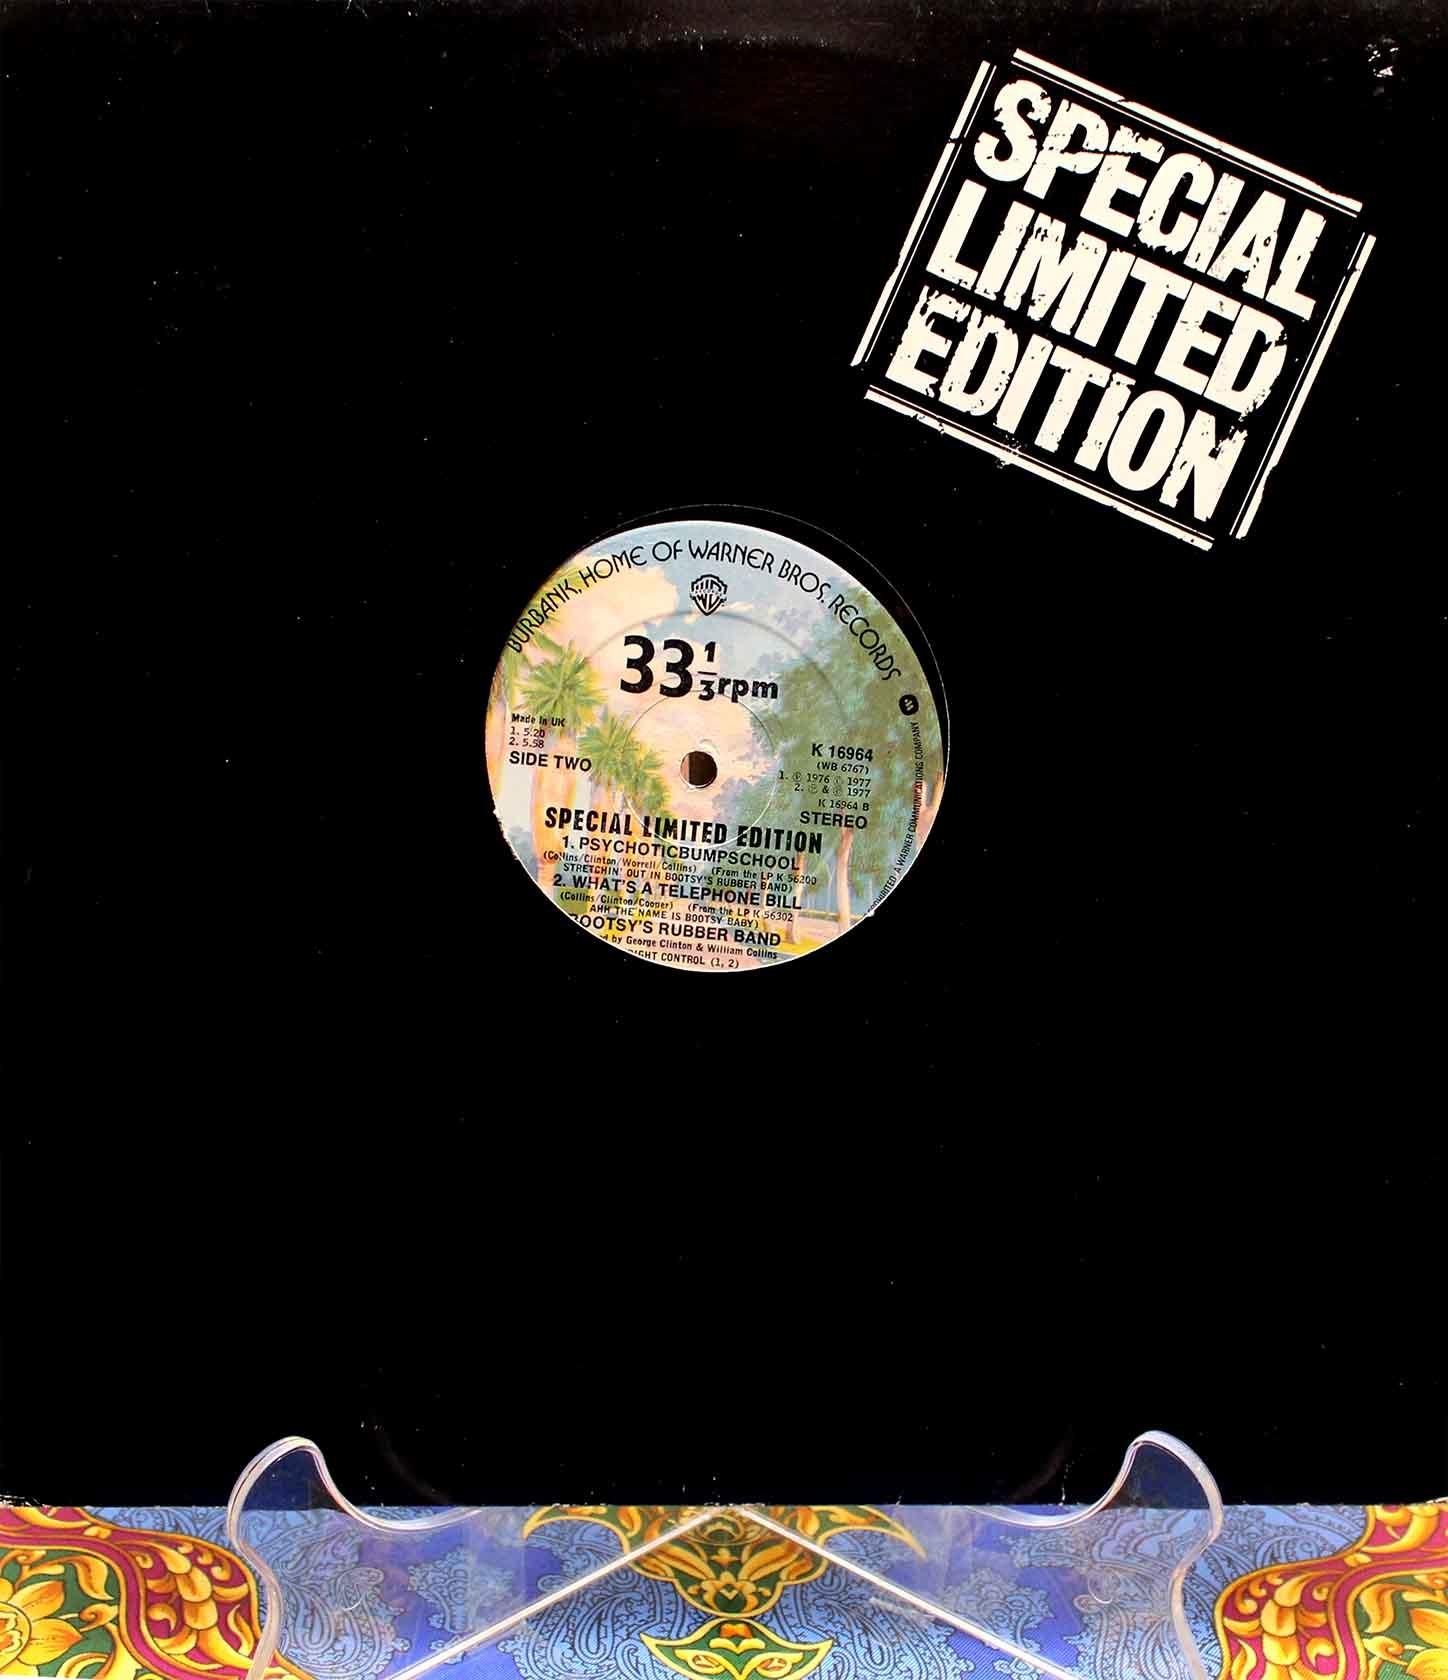 Bootsys Rubber Band – Psychoticbumpschool 01